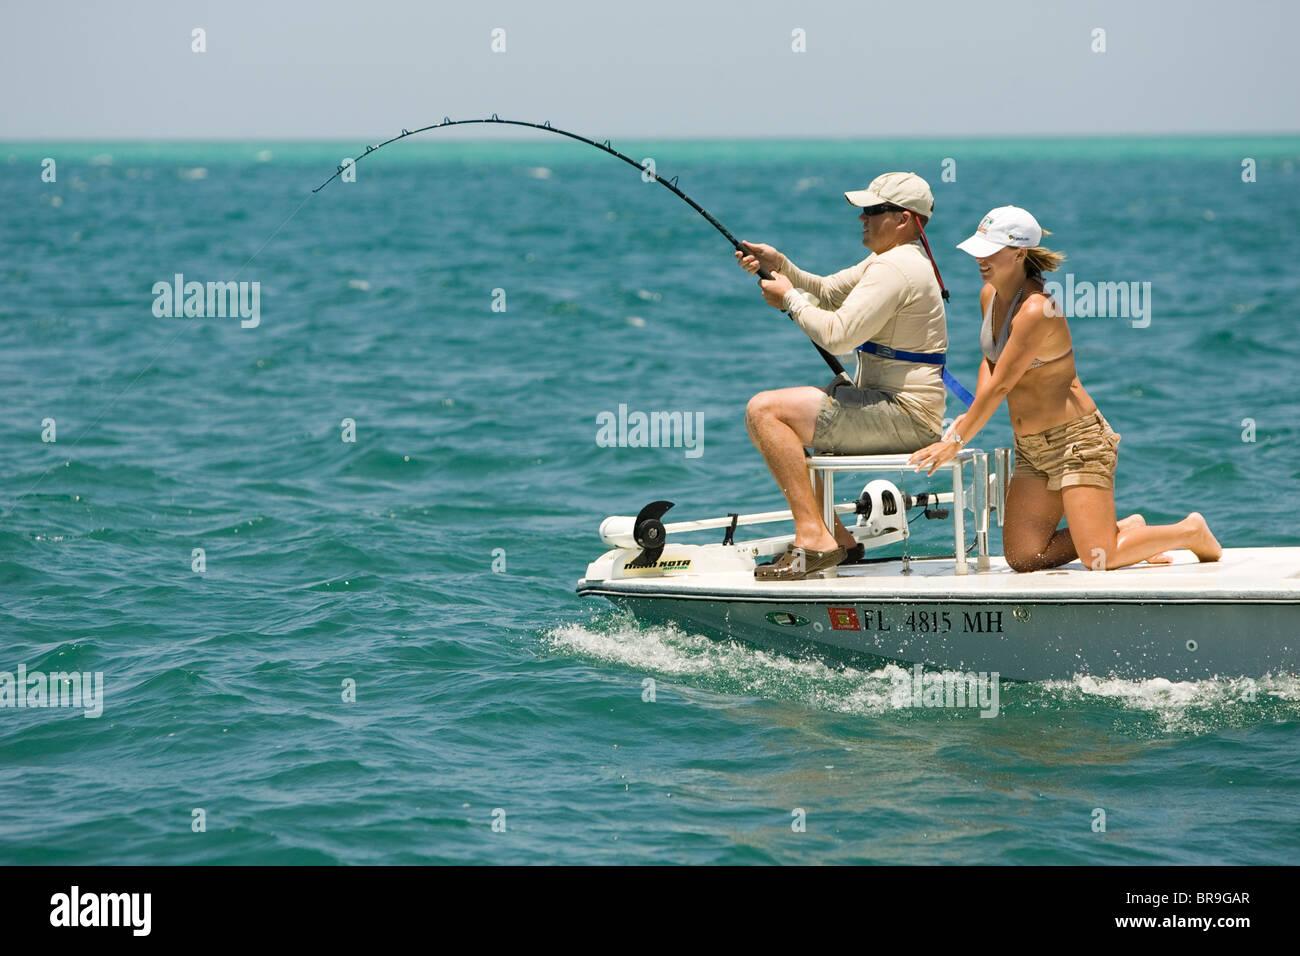 Fishing for tarpon on florida 39 s boca grande pass stock for Tarpon fishing florida